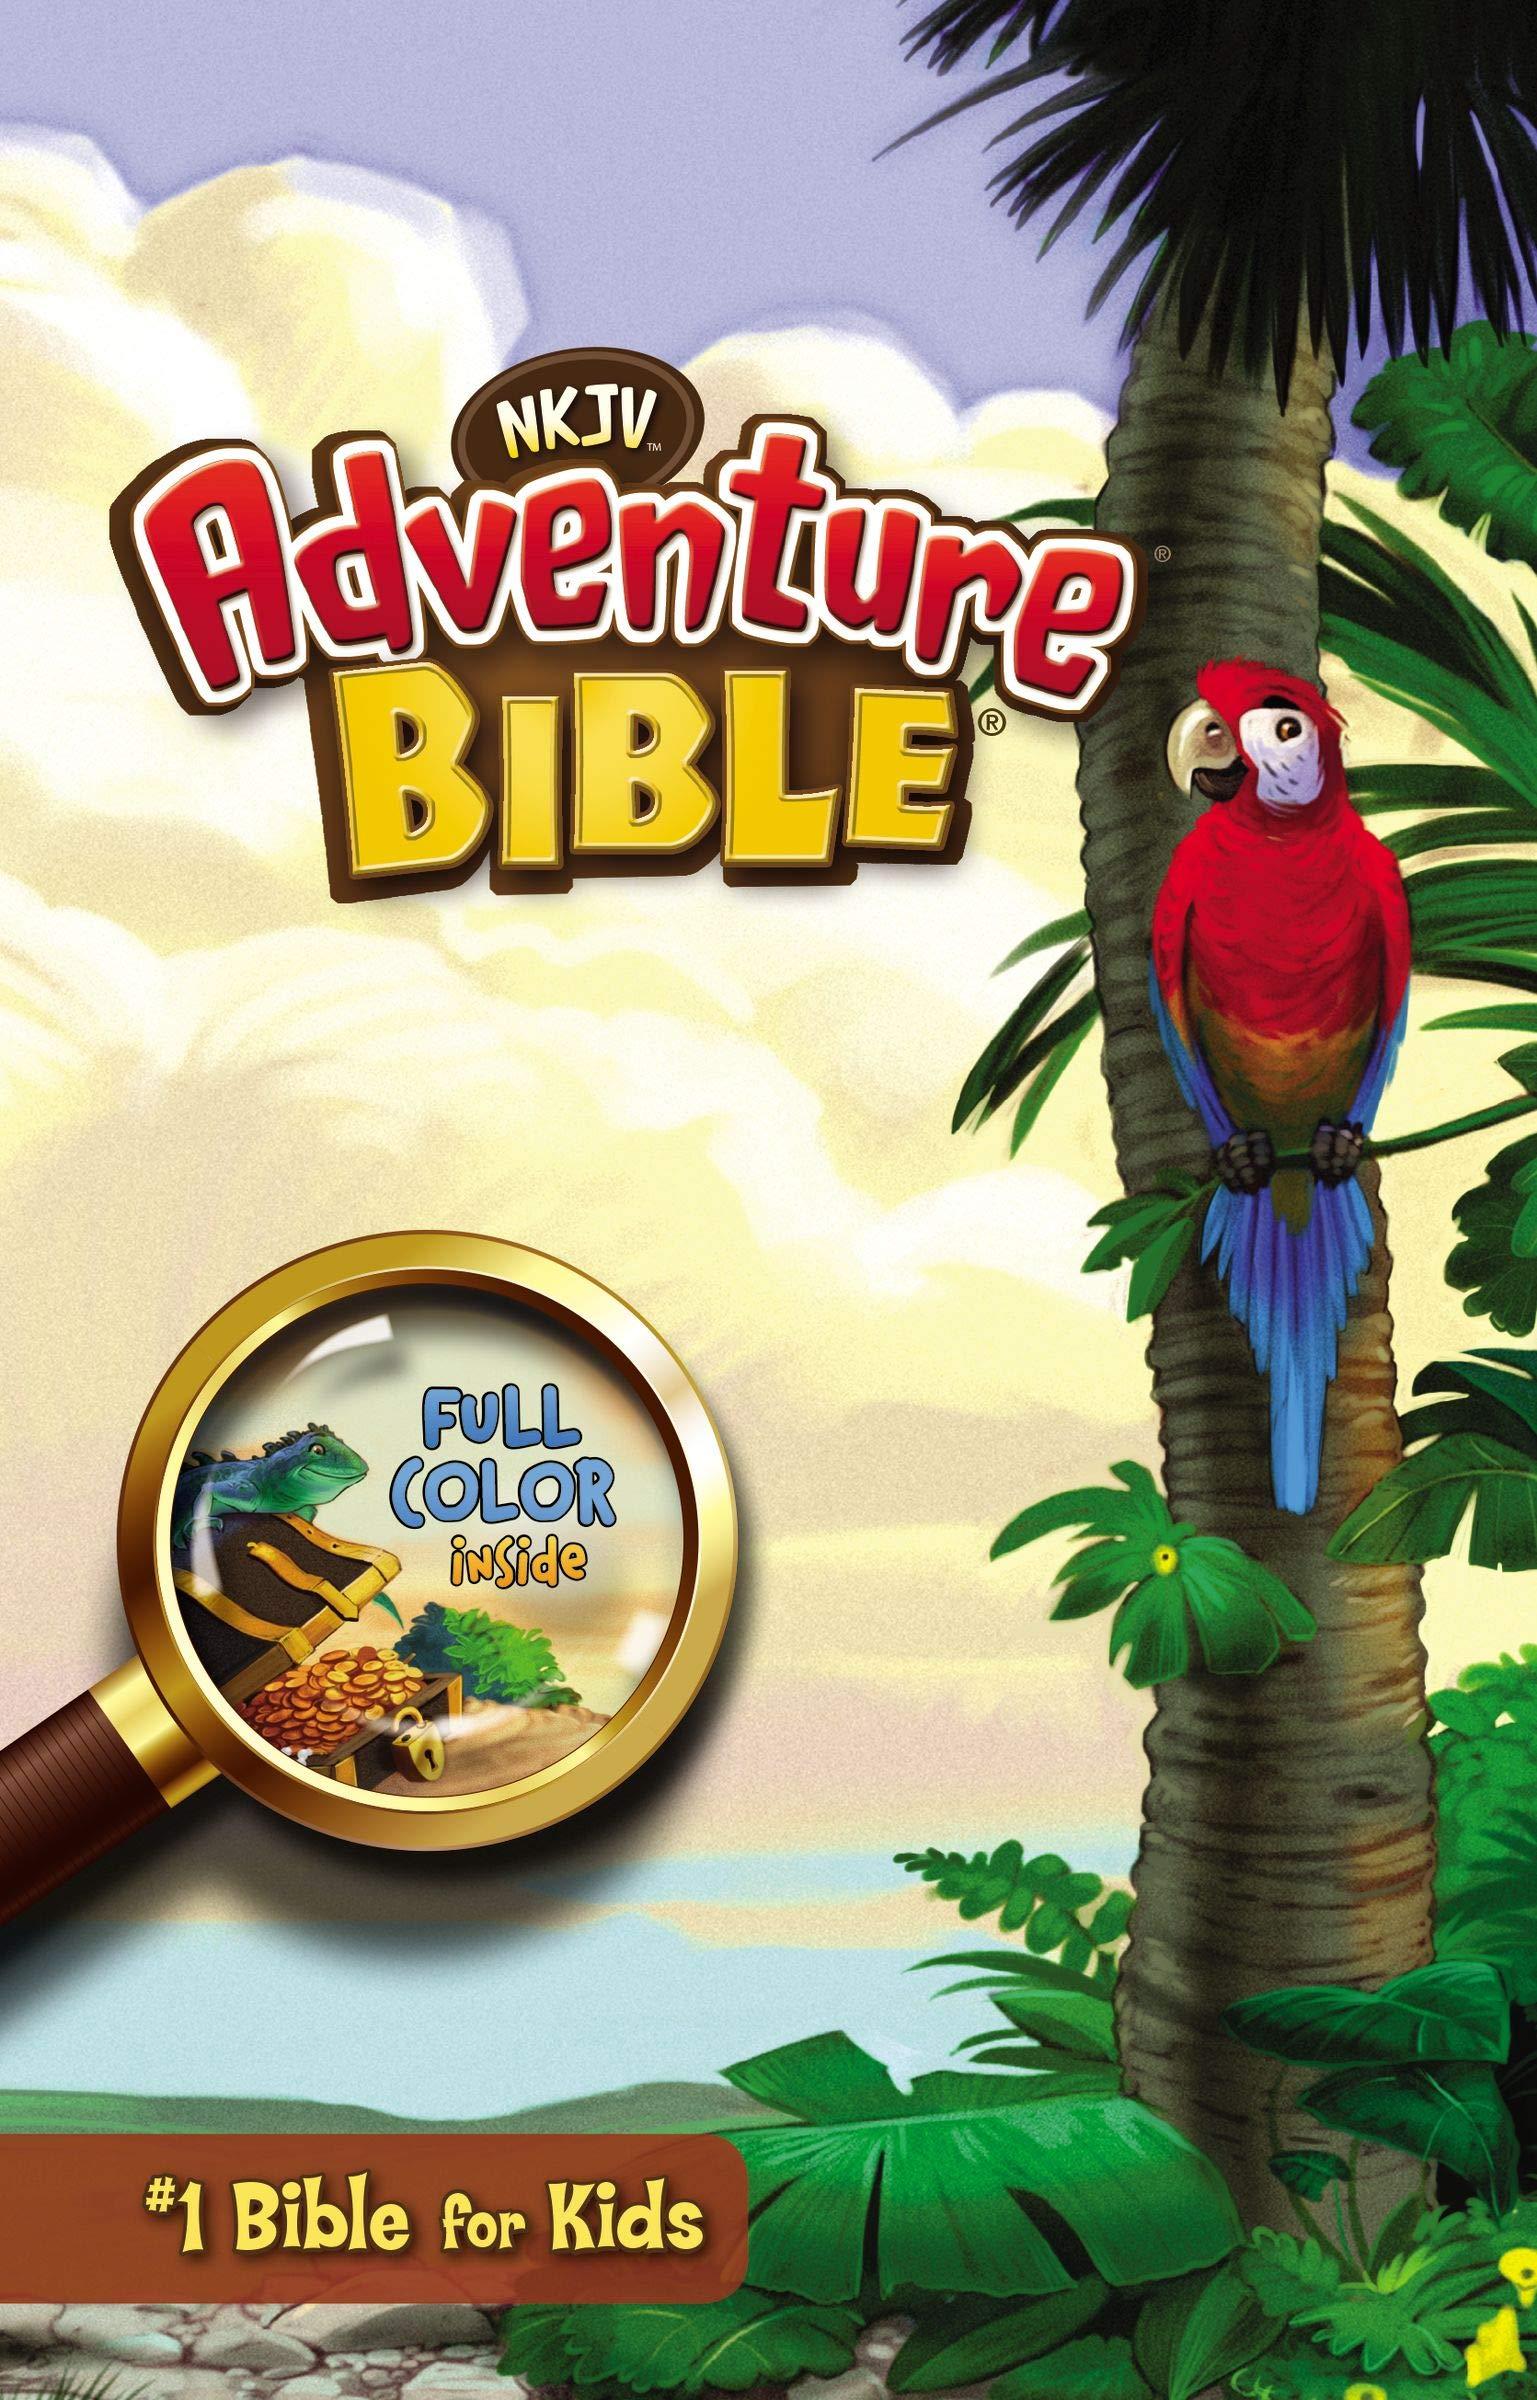 NKJV, Adventure Bible, Hardcover, Full Color: Lawrence O